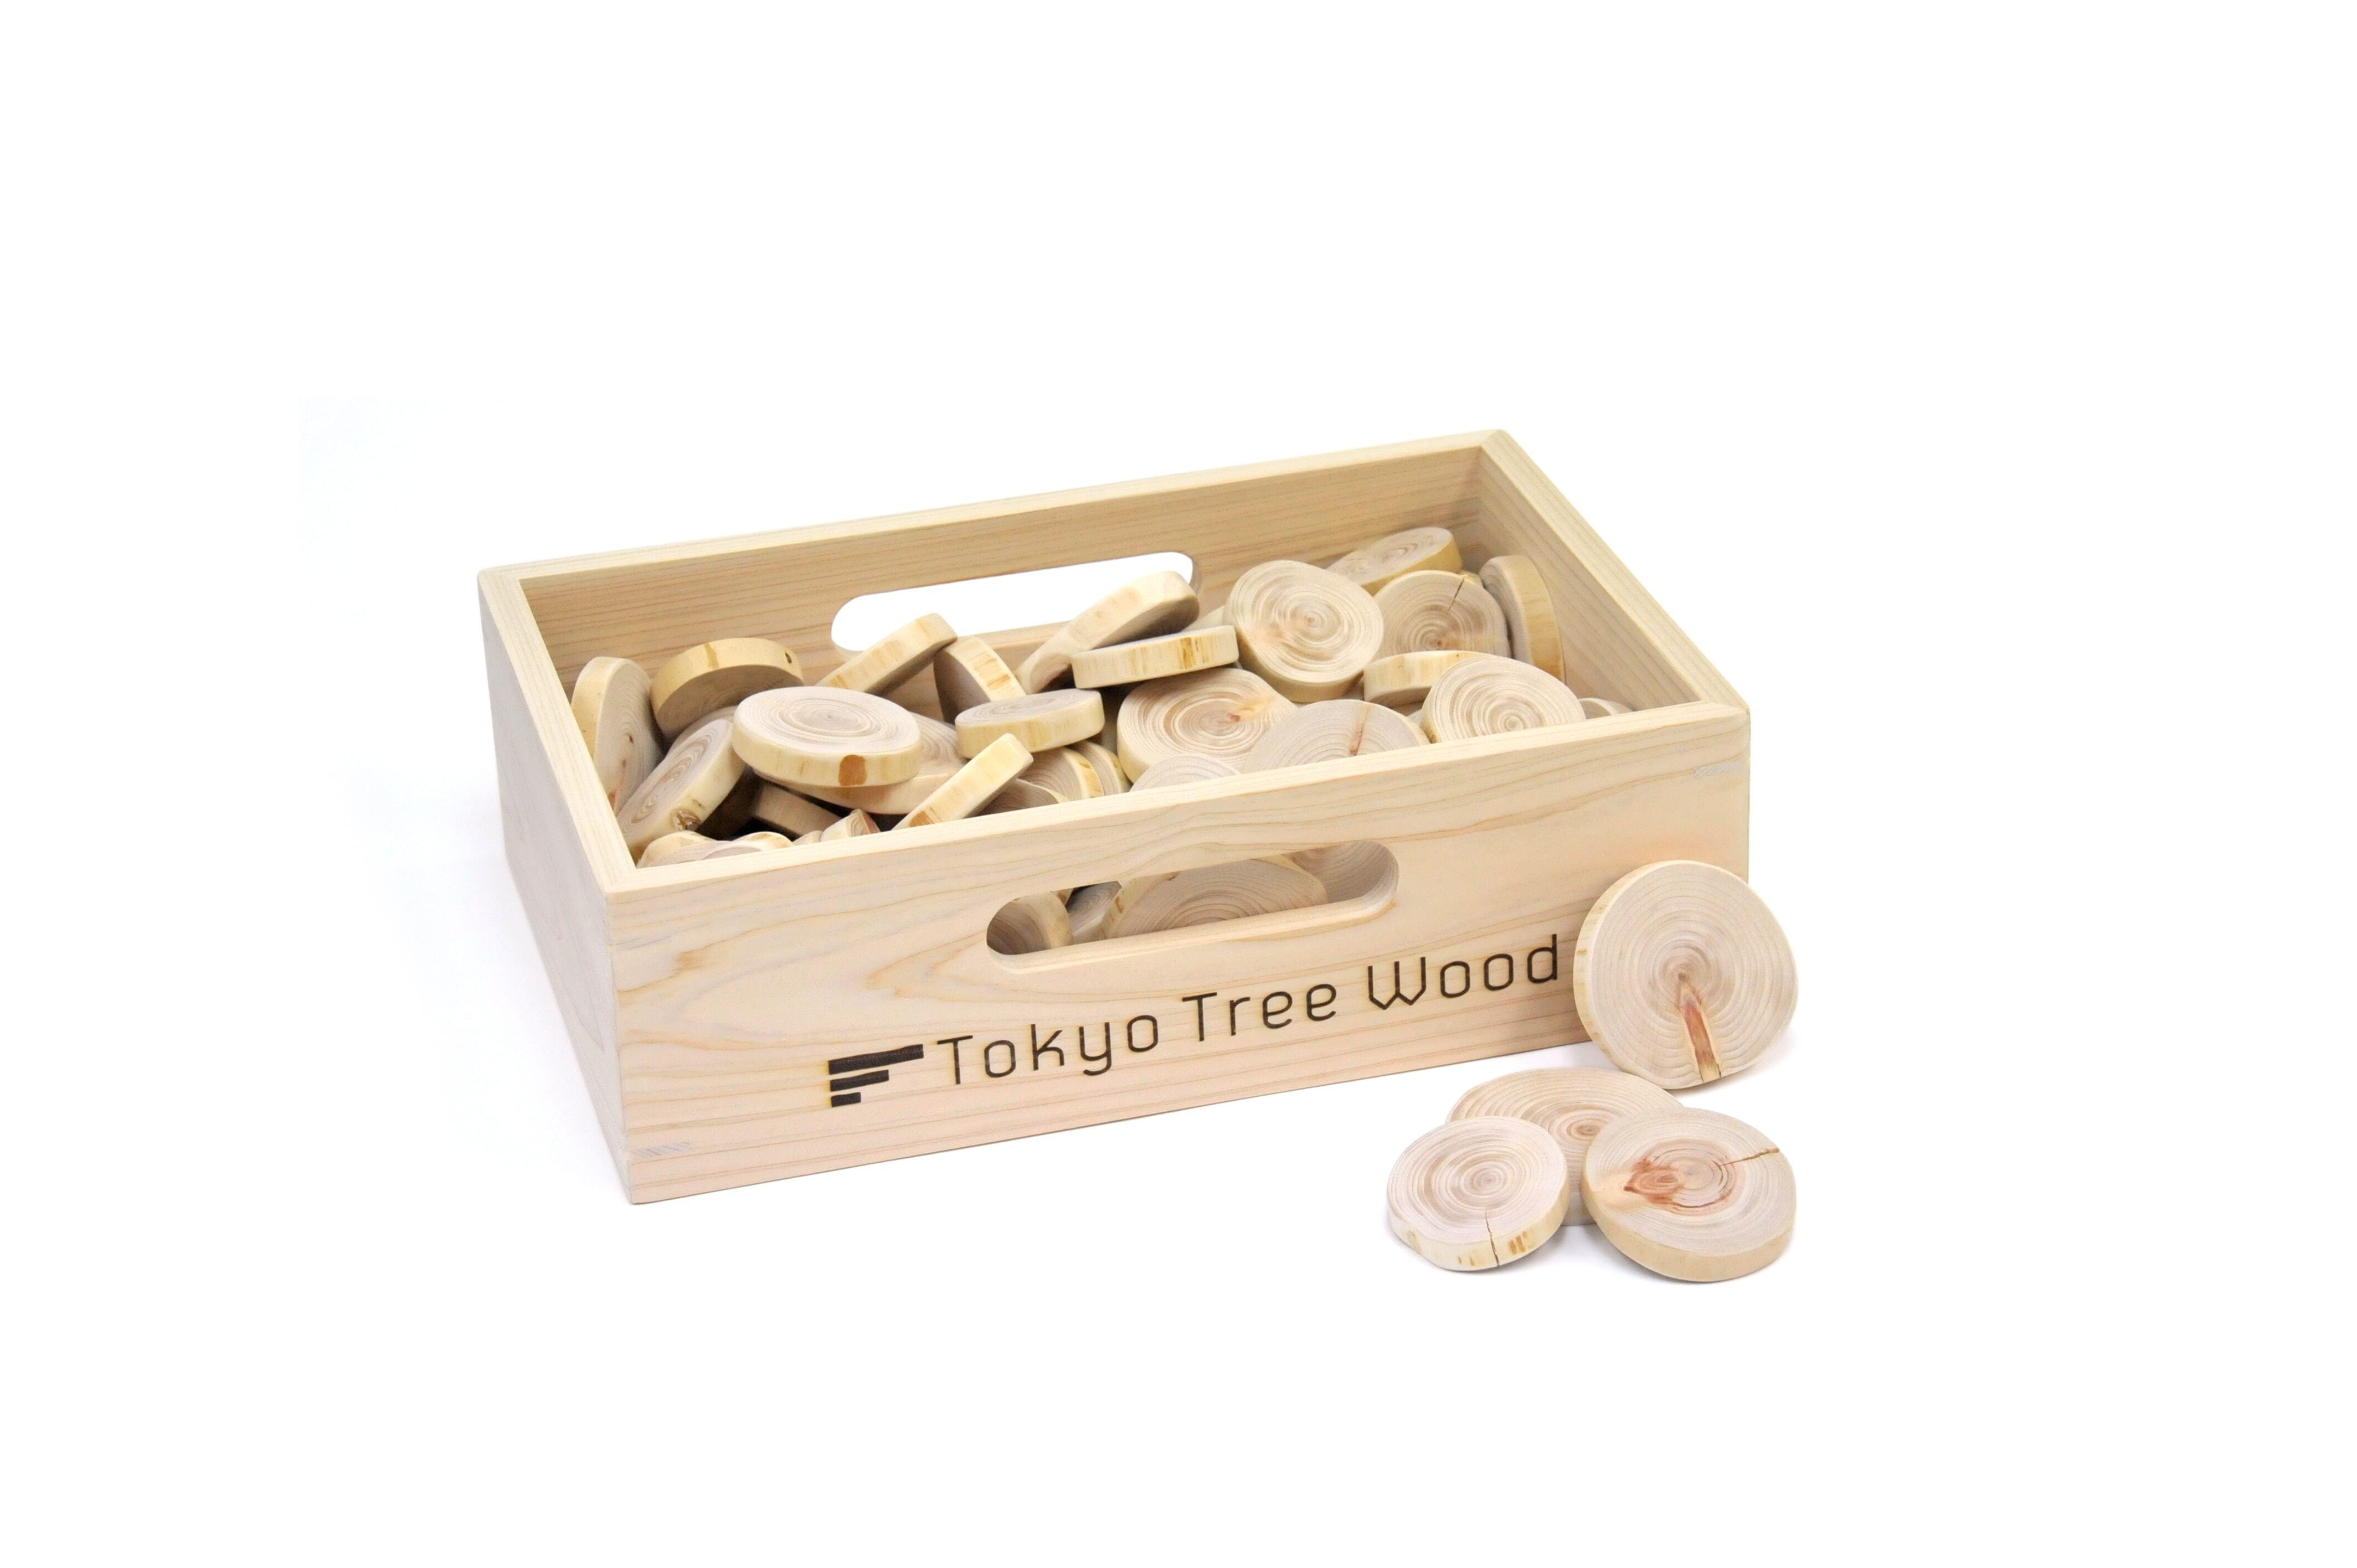 Tokyo Tree Wood コグチギリ 木箱入り